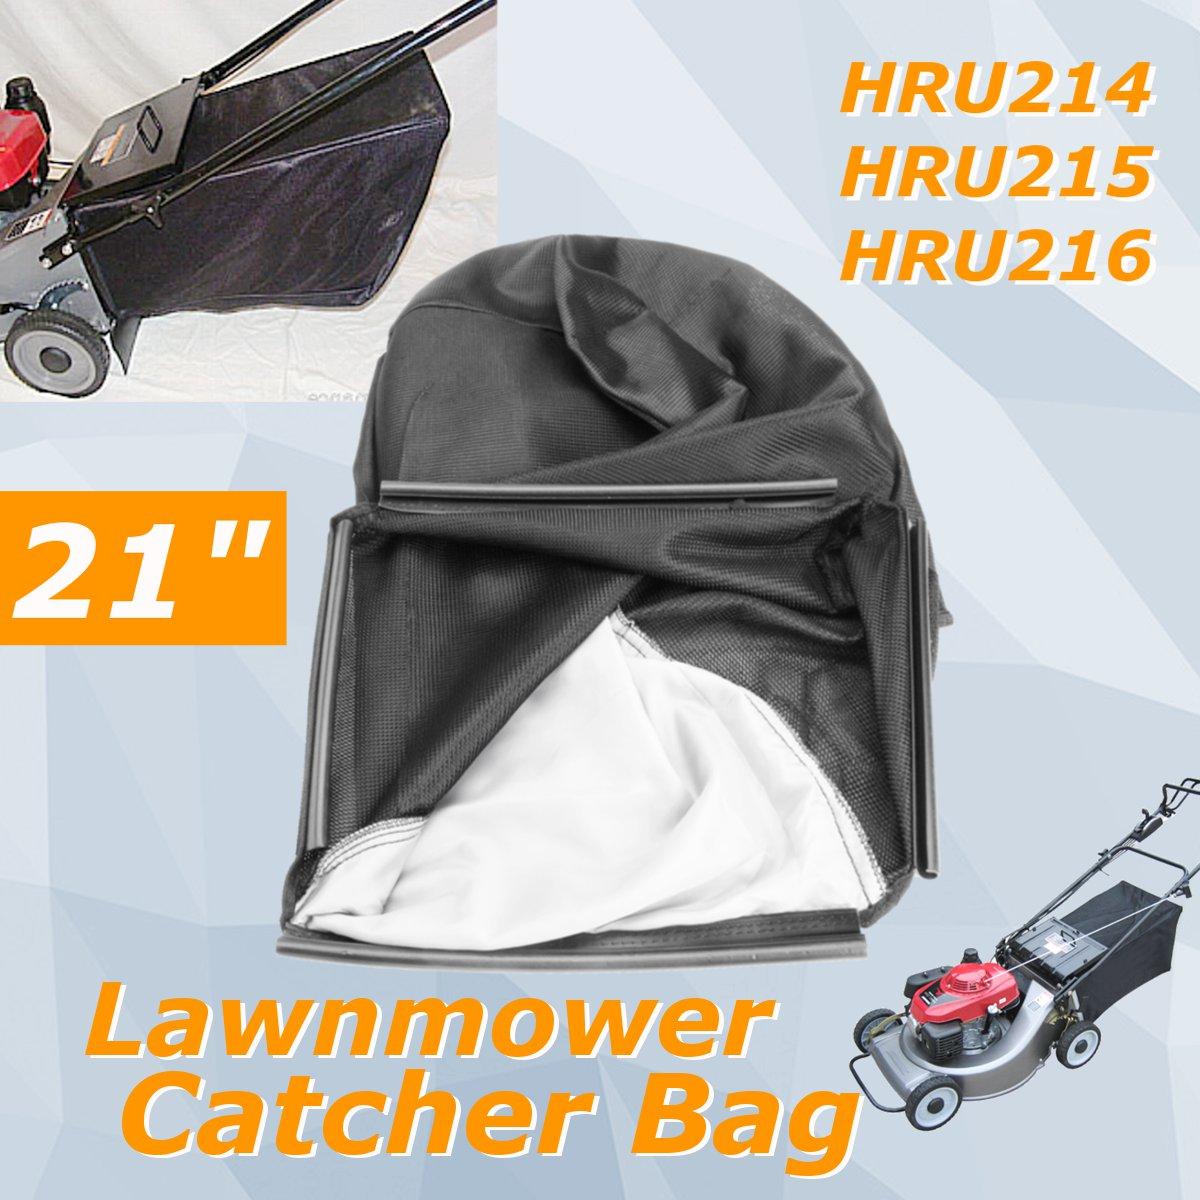 Lawnmower Leaf Grass Catcher Bag for 21inch Hondas HRU214 HRU215 HRU216 Lawn MowerLawnmower Leaf Grass Catcher Bag for 21inch Hondas HRU214 HRU215 HRU216 Lawn Mower